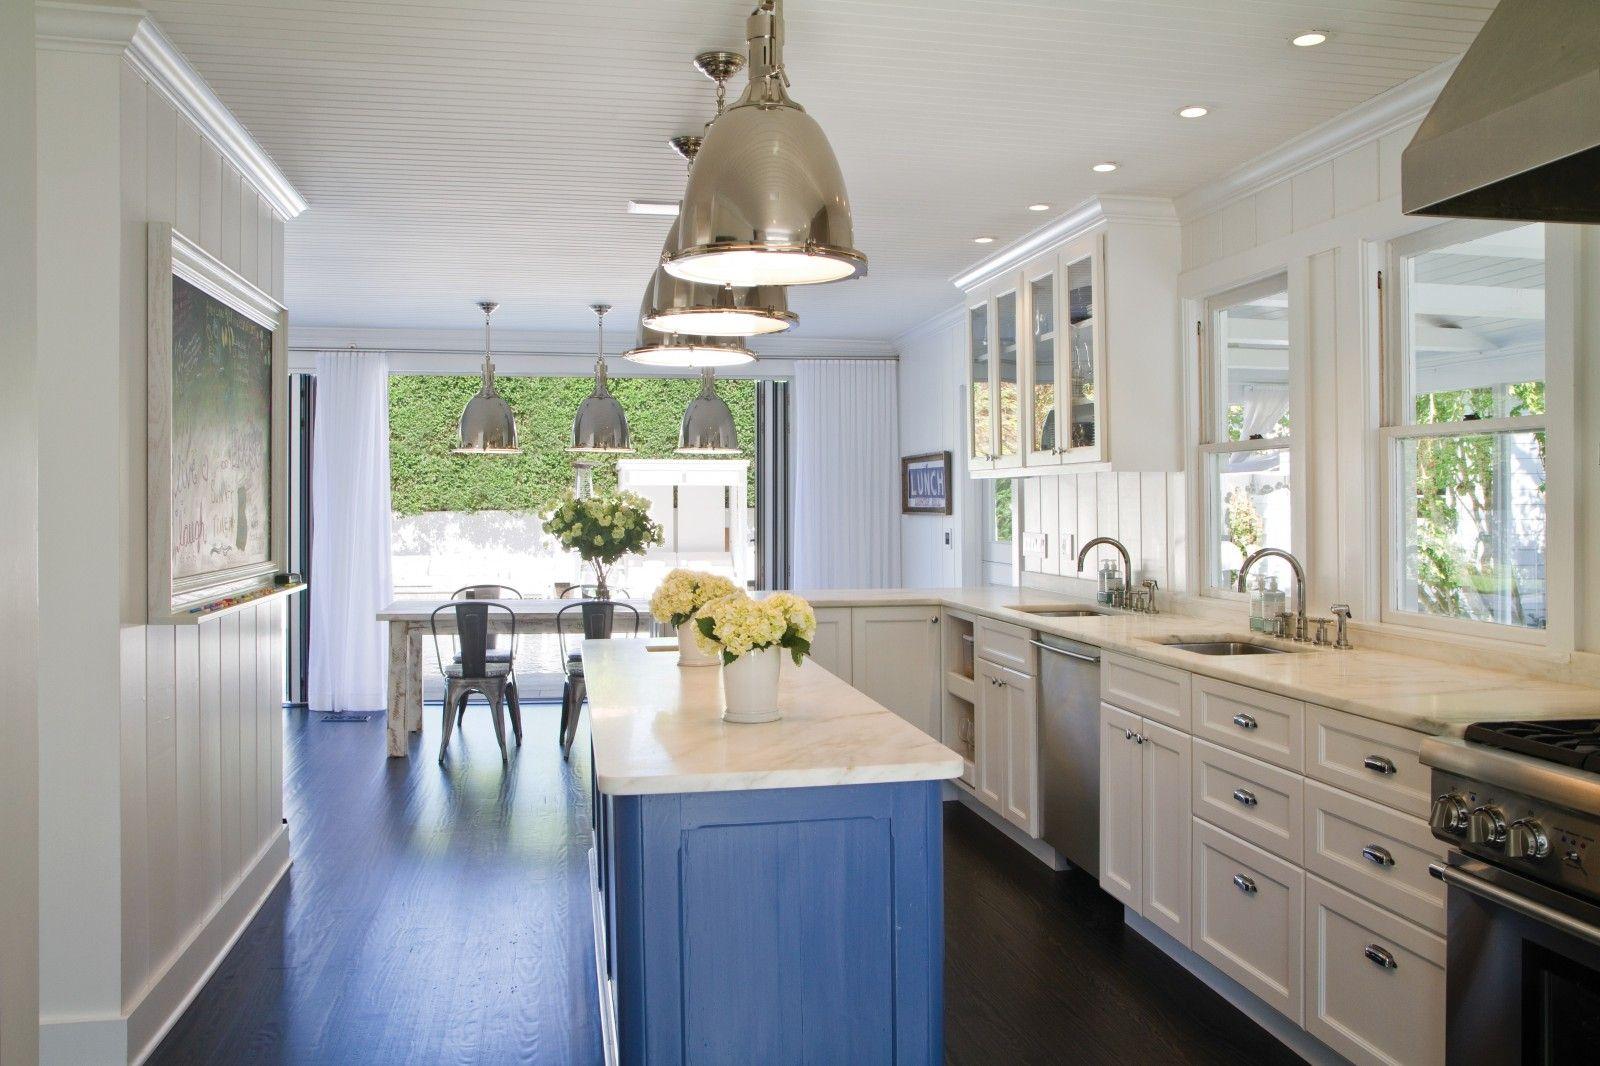 small beach house kitchen design ideas – house design ideas